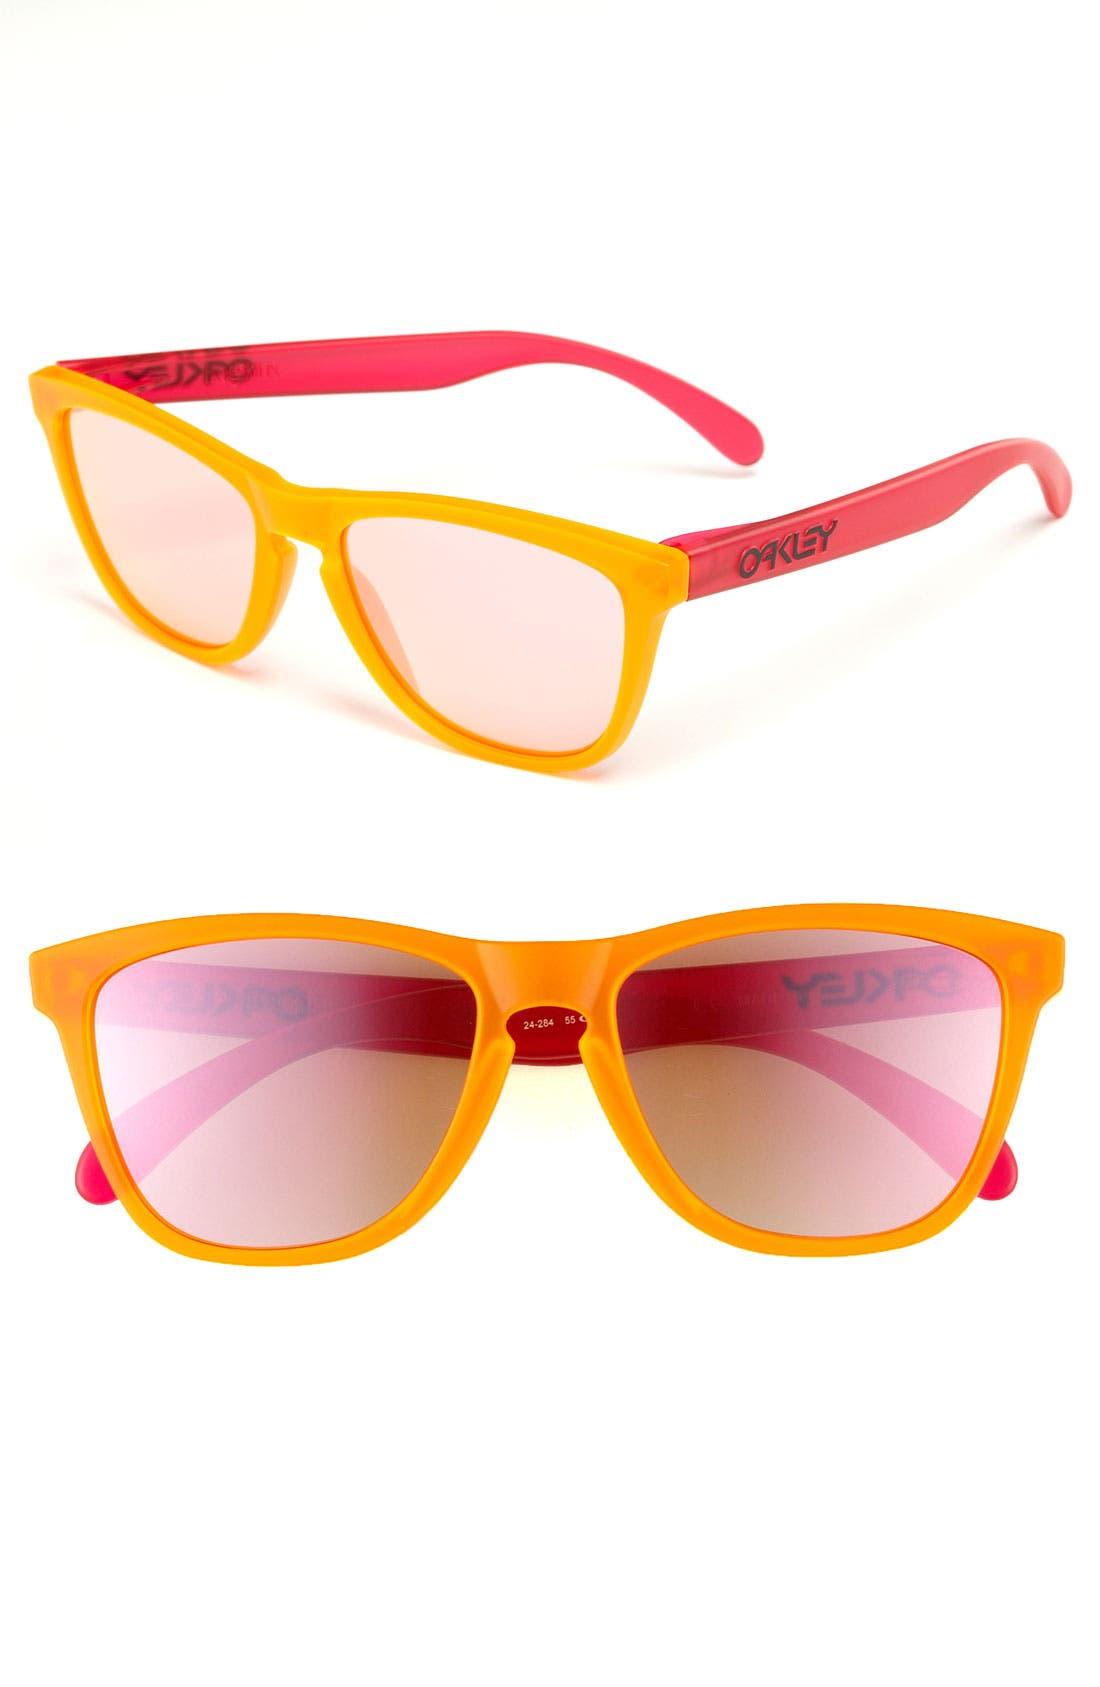 Main Image - Oakley 'Frogskins® - Blacklight Edition' 57mm Sunglasses